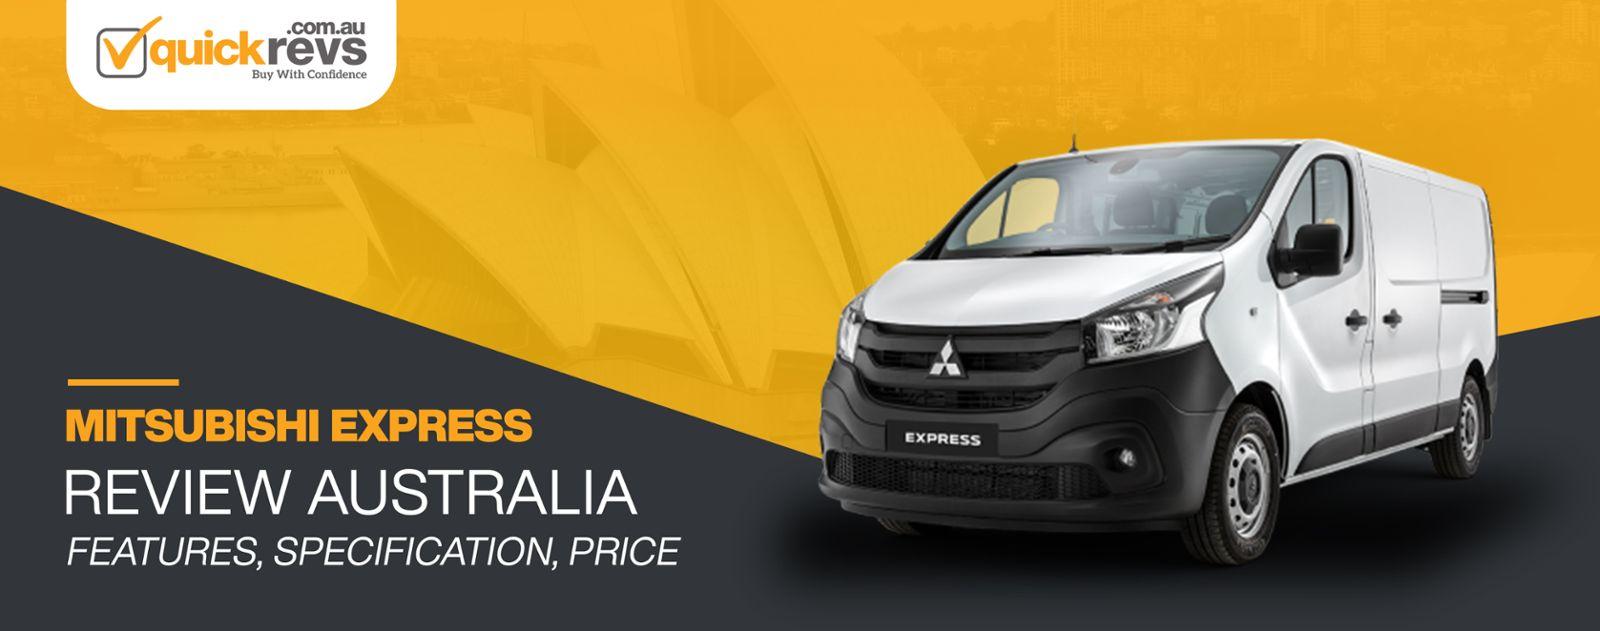 Mitsubishi Express Review Australia